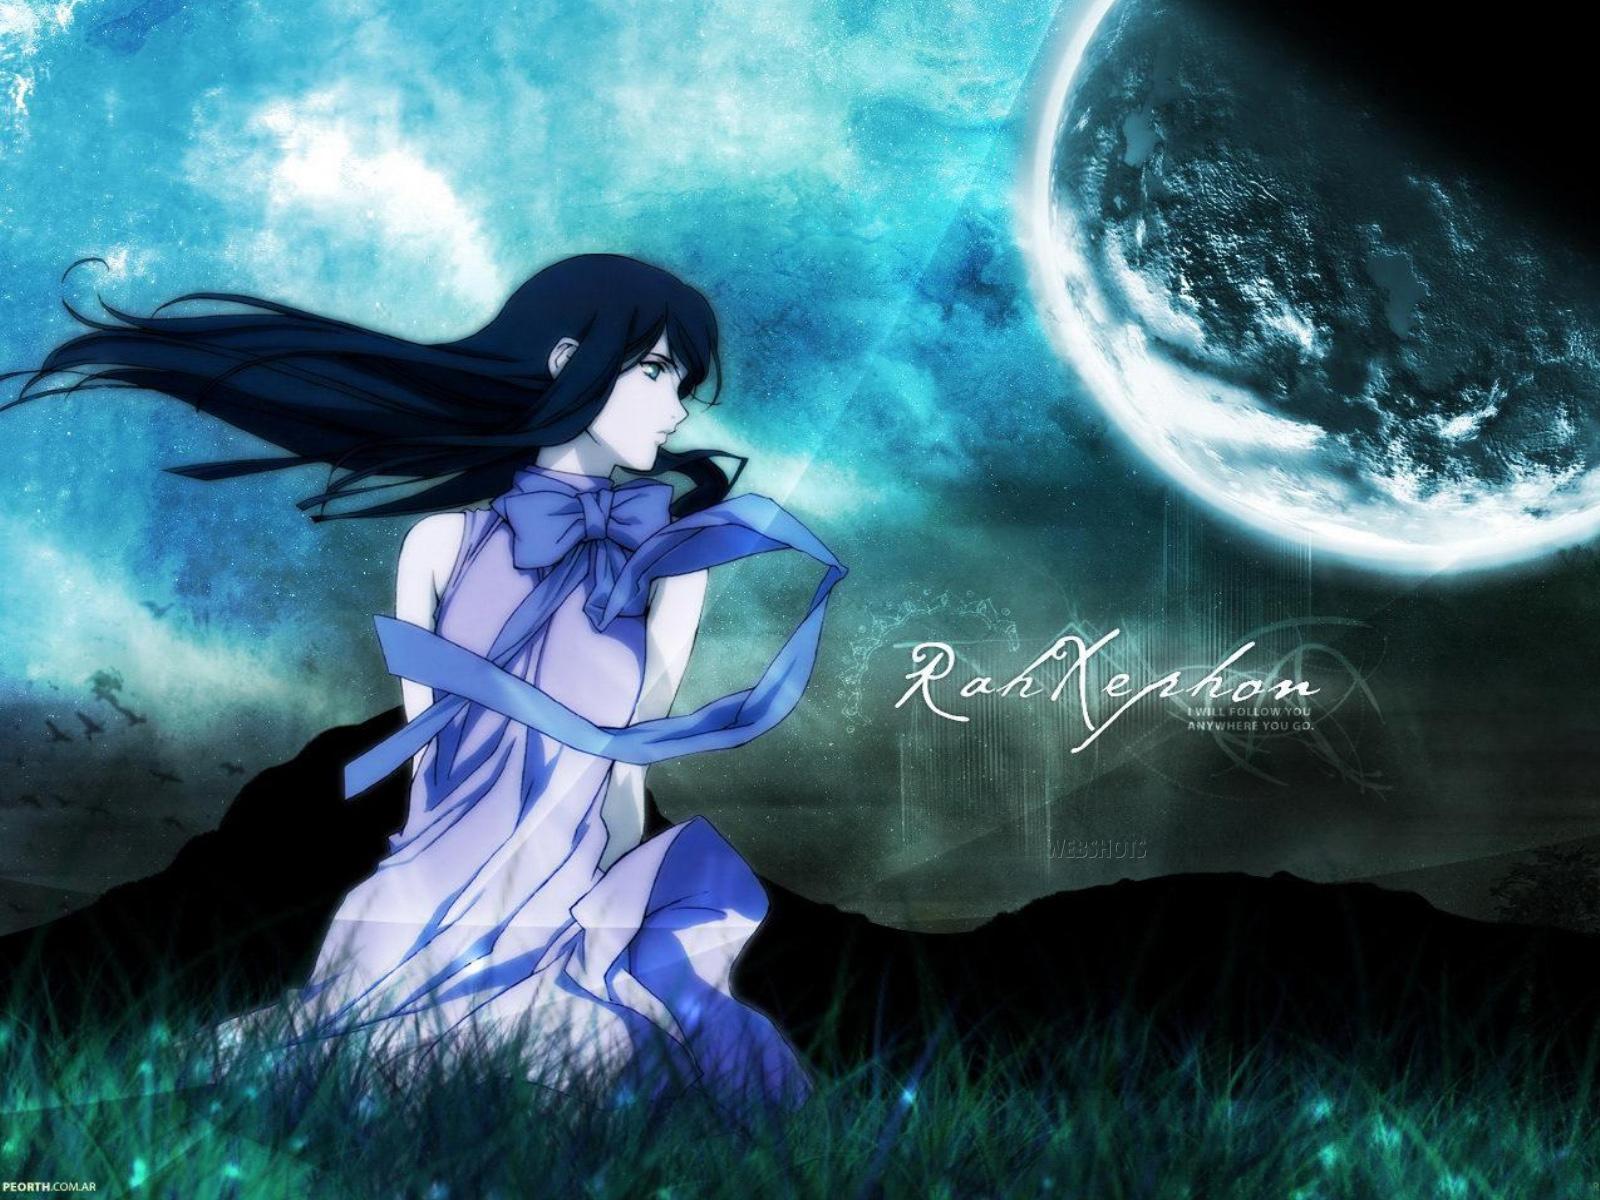 Foto Anime Keren 3d - Moa Gambar